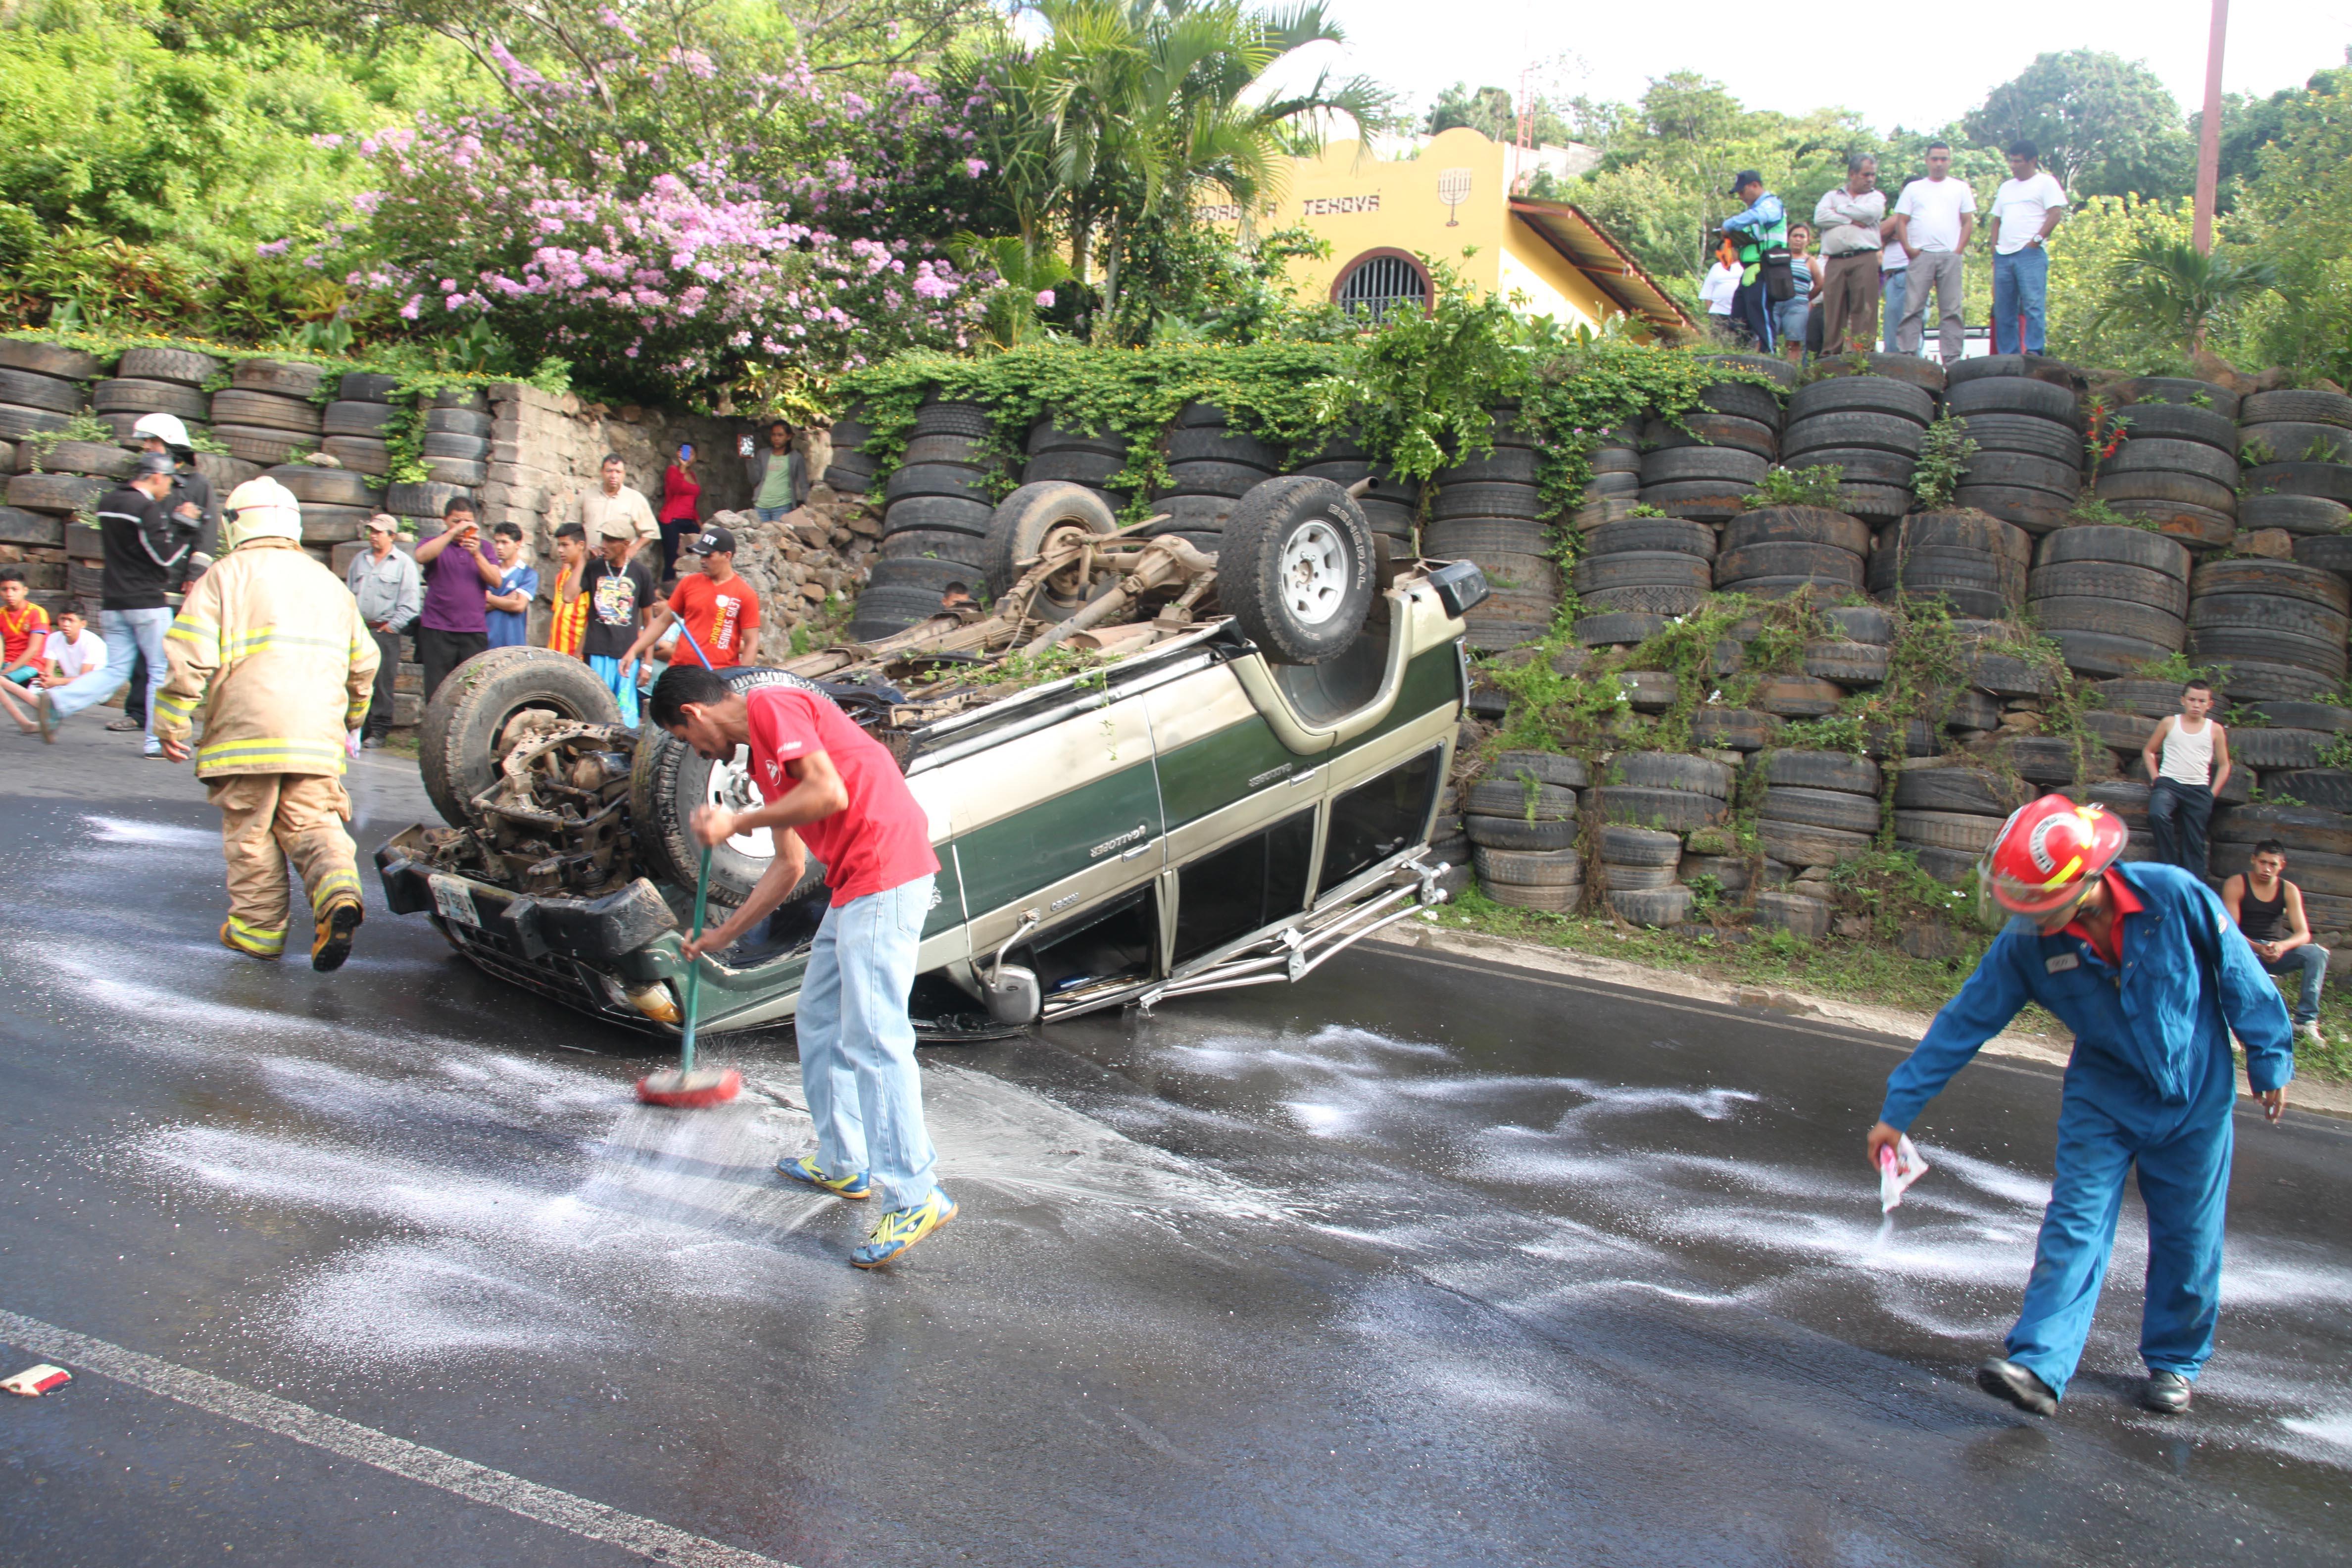 Limpian zona donde se impactó el automóvil. LA PRENSA/LUIS E. MARTÍNEZ.